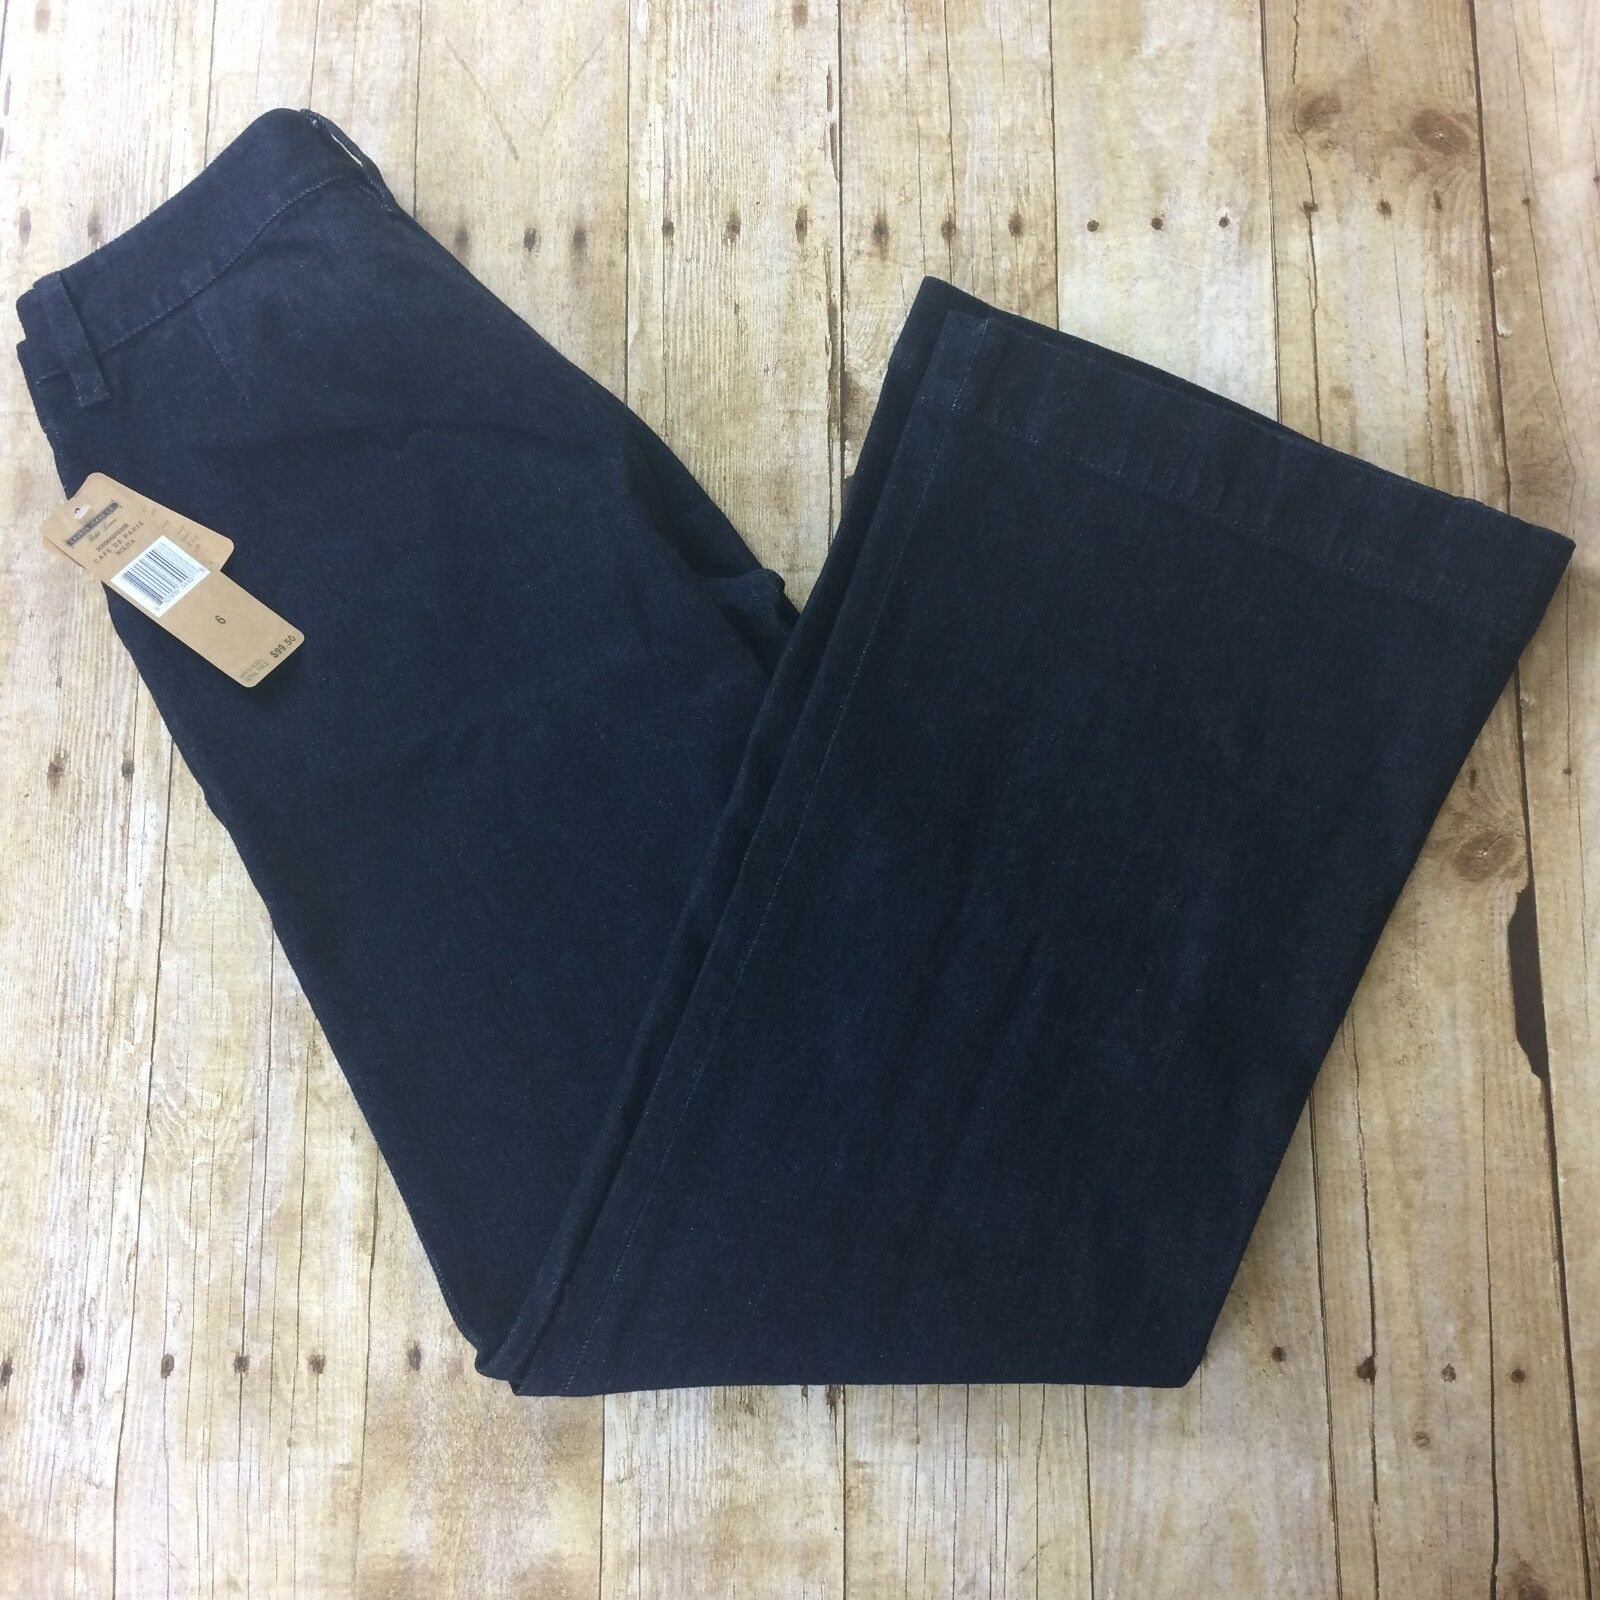 Ralph Lauren Jeans Company Sz 6 Nolita Wide Leg Dark Wash bluee Denim Jeans